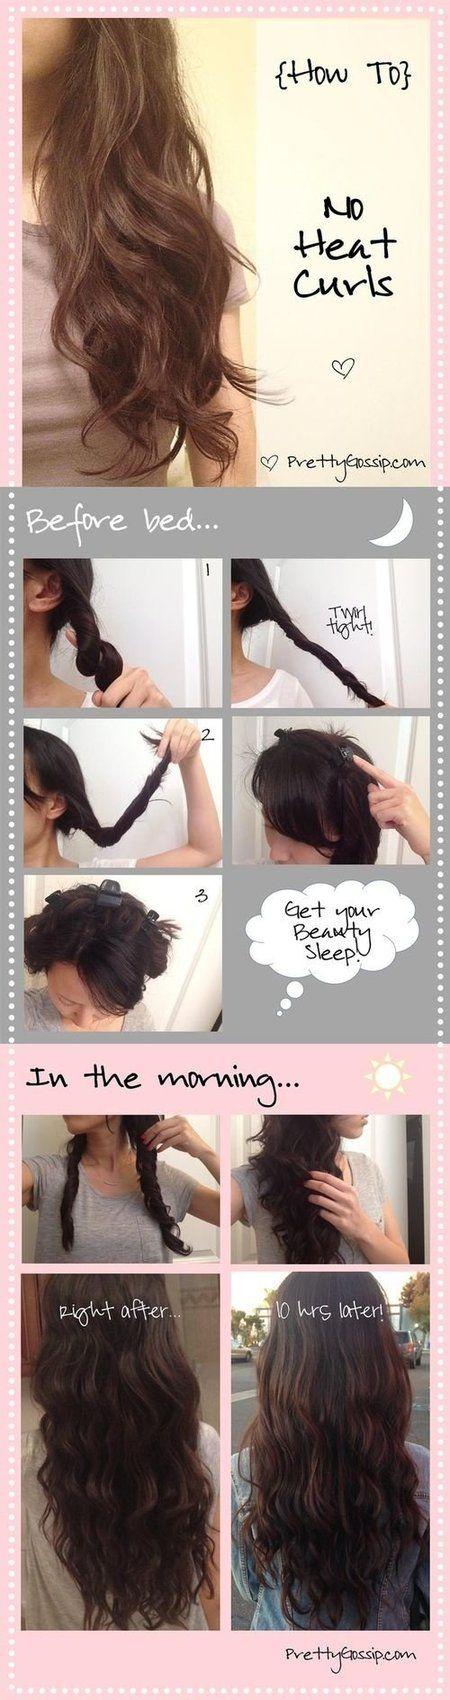 Tutorial - No heat curls #hair #curls